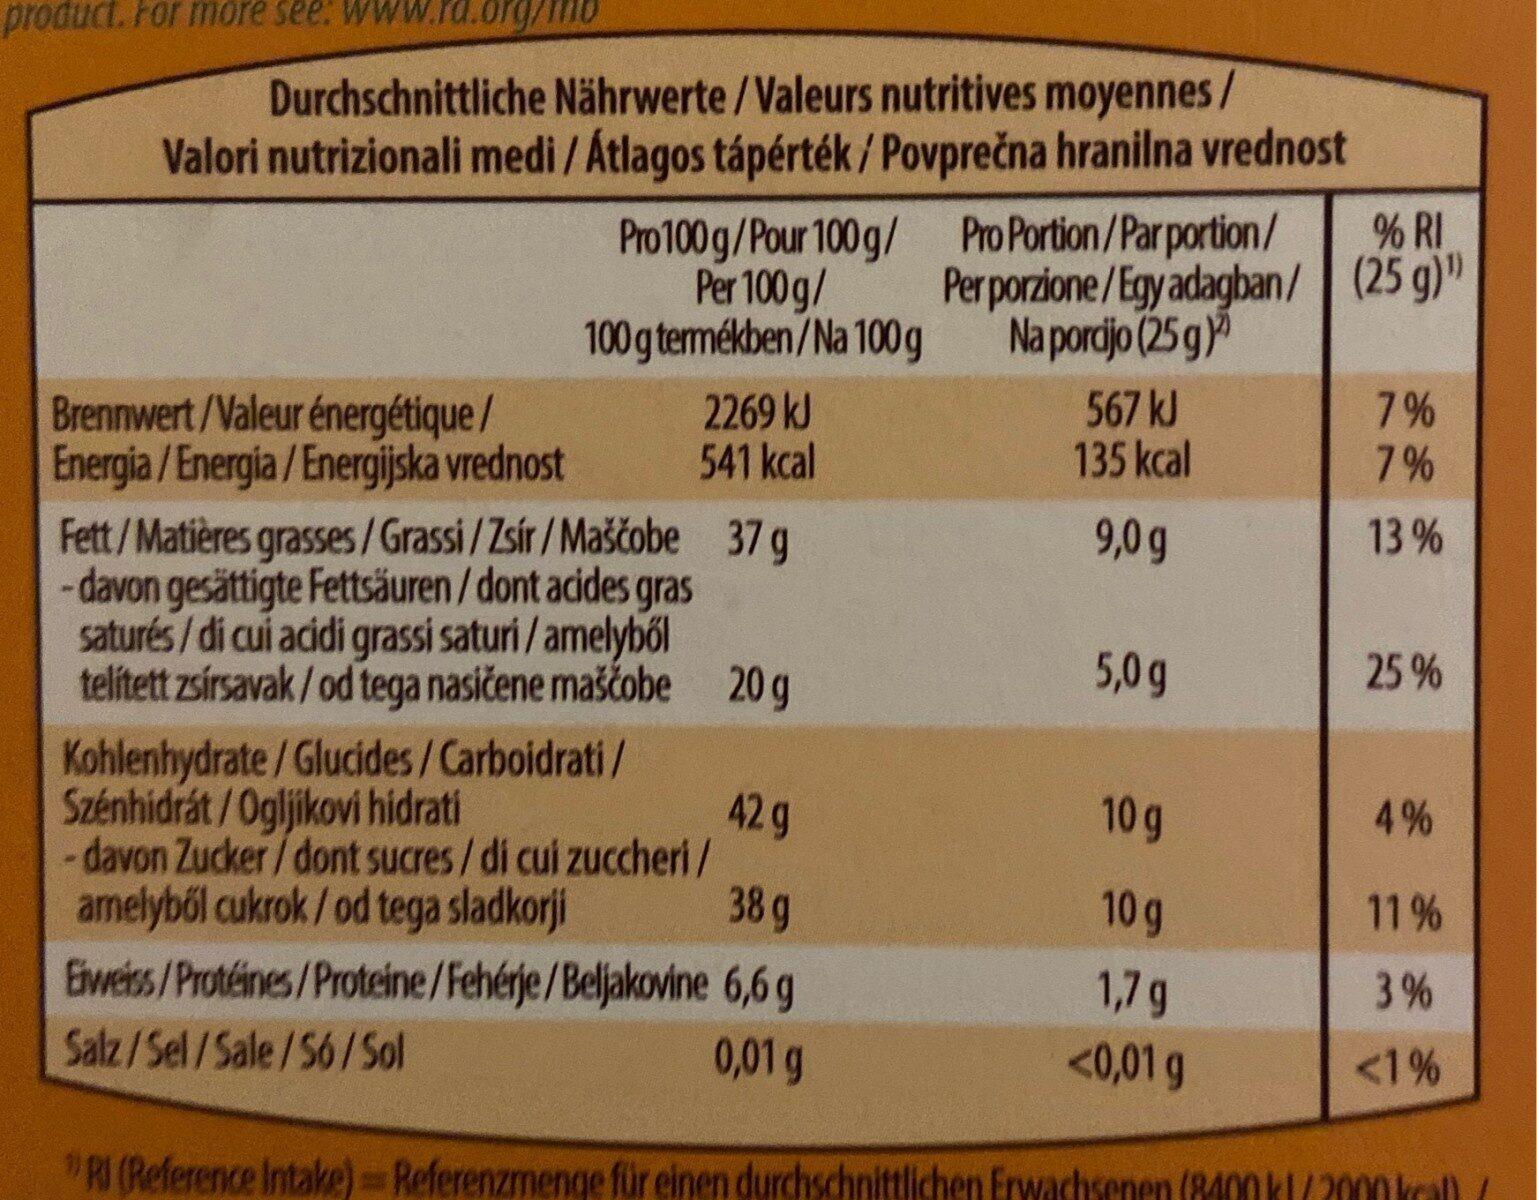 Apricot&Hazenuts - Valori nutrizionali - fr